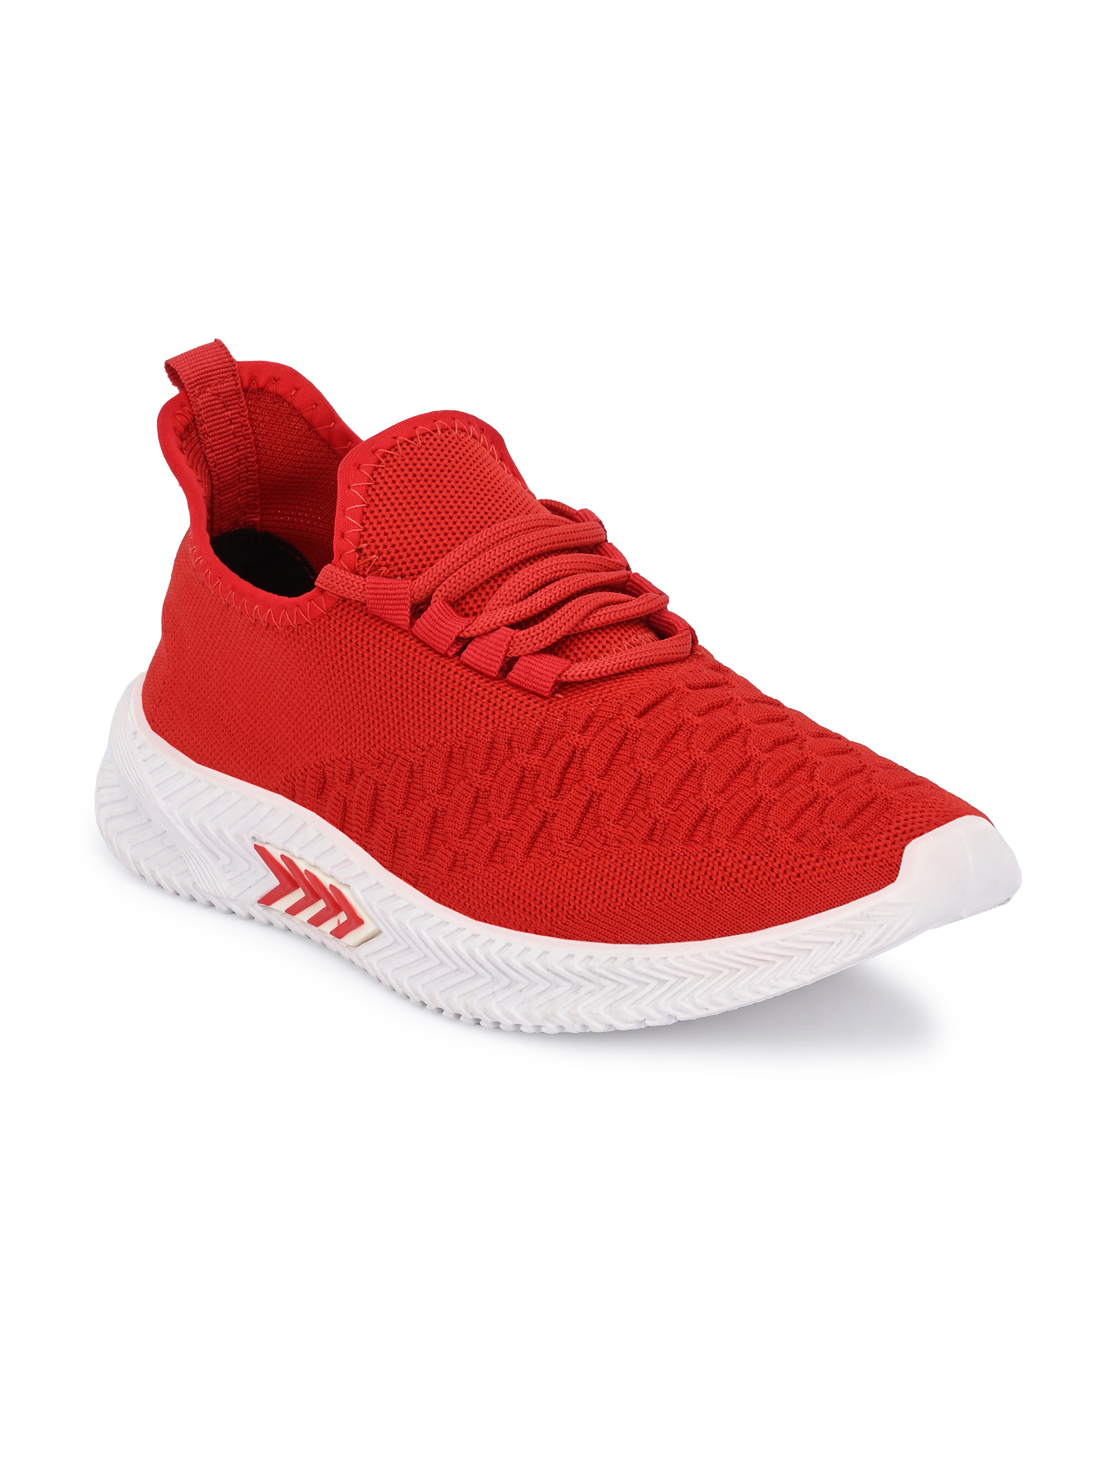 Hirolas | Hirolas® Men's Red Knitted Gym/Walking/Running athleisure Sports Sneaker Shoes